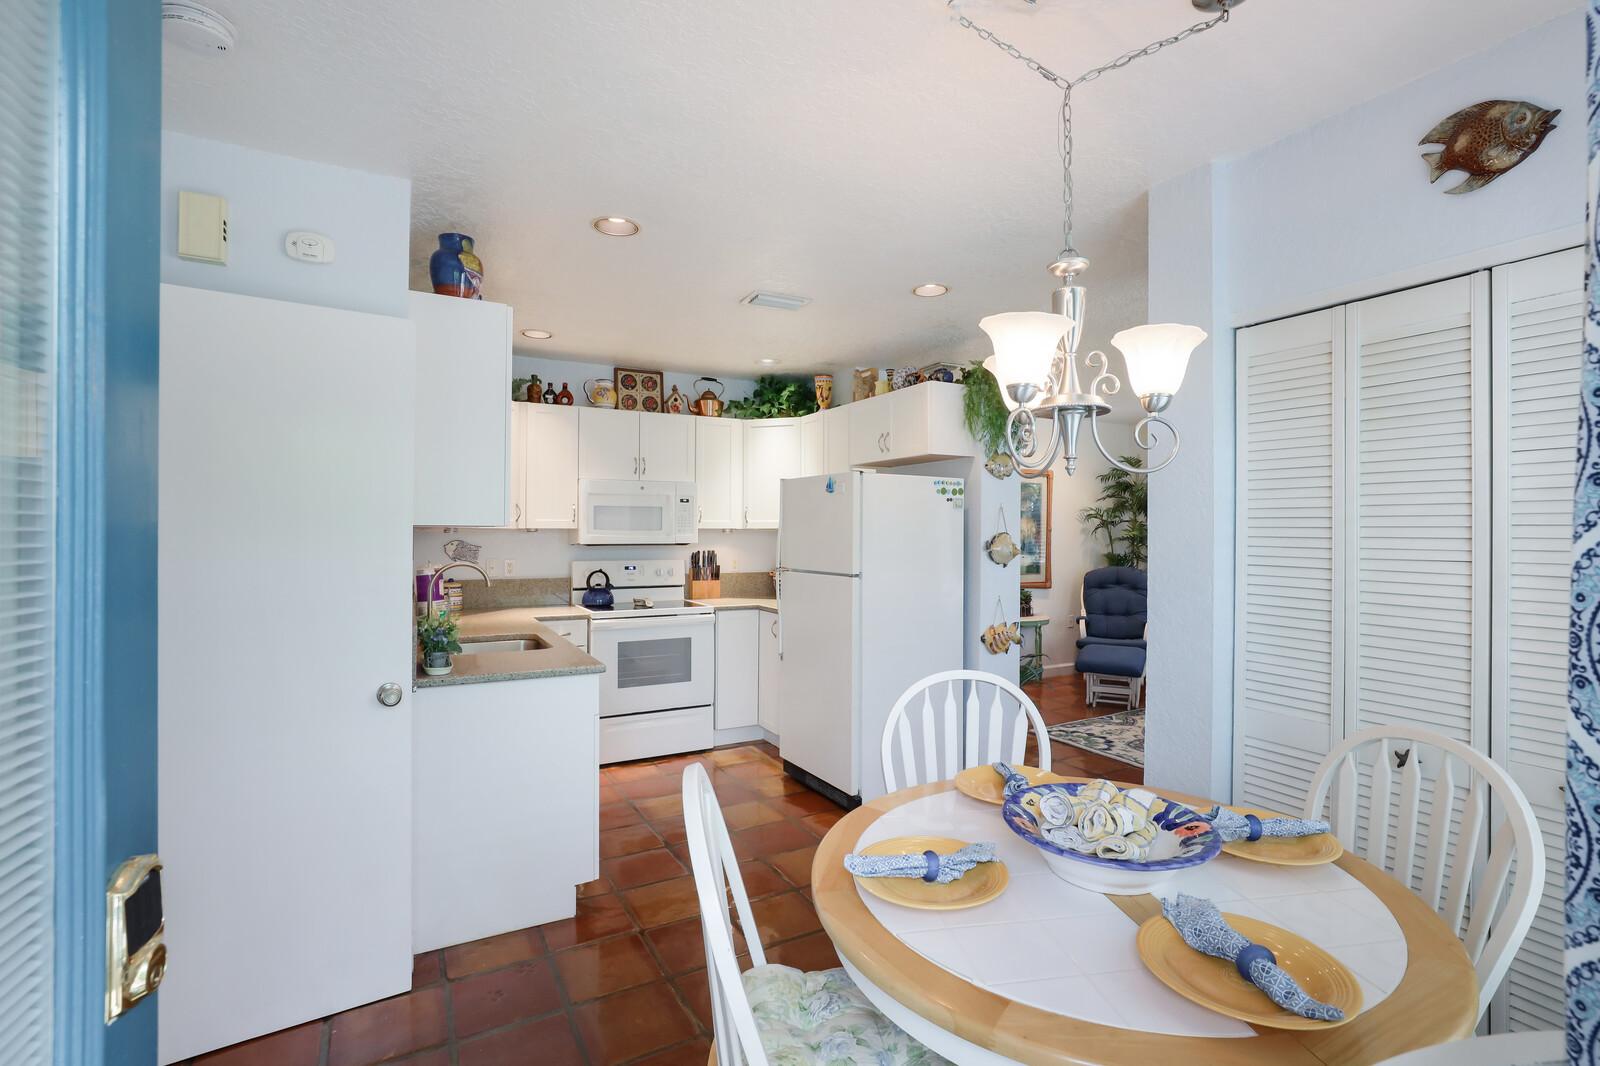 Oleander Villa kitchen and dining